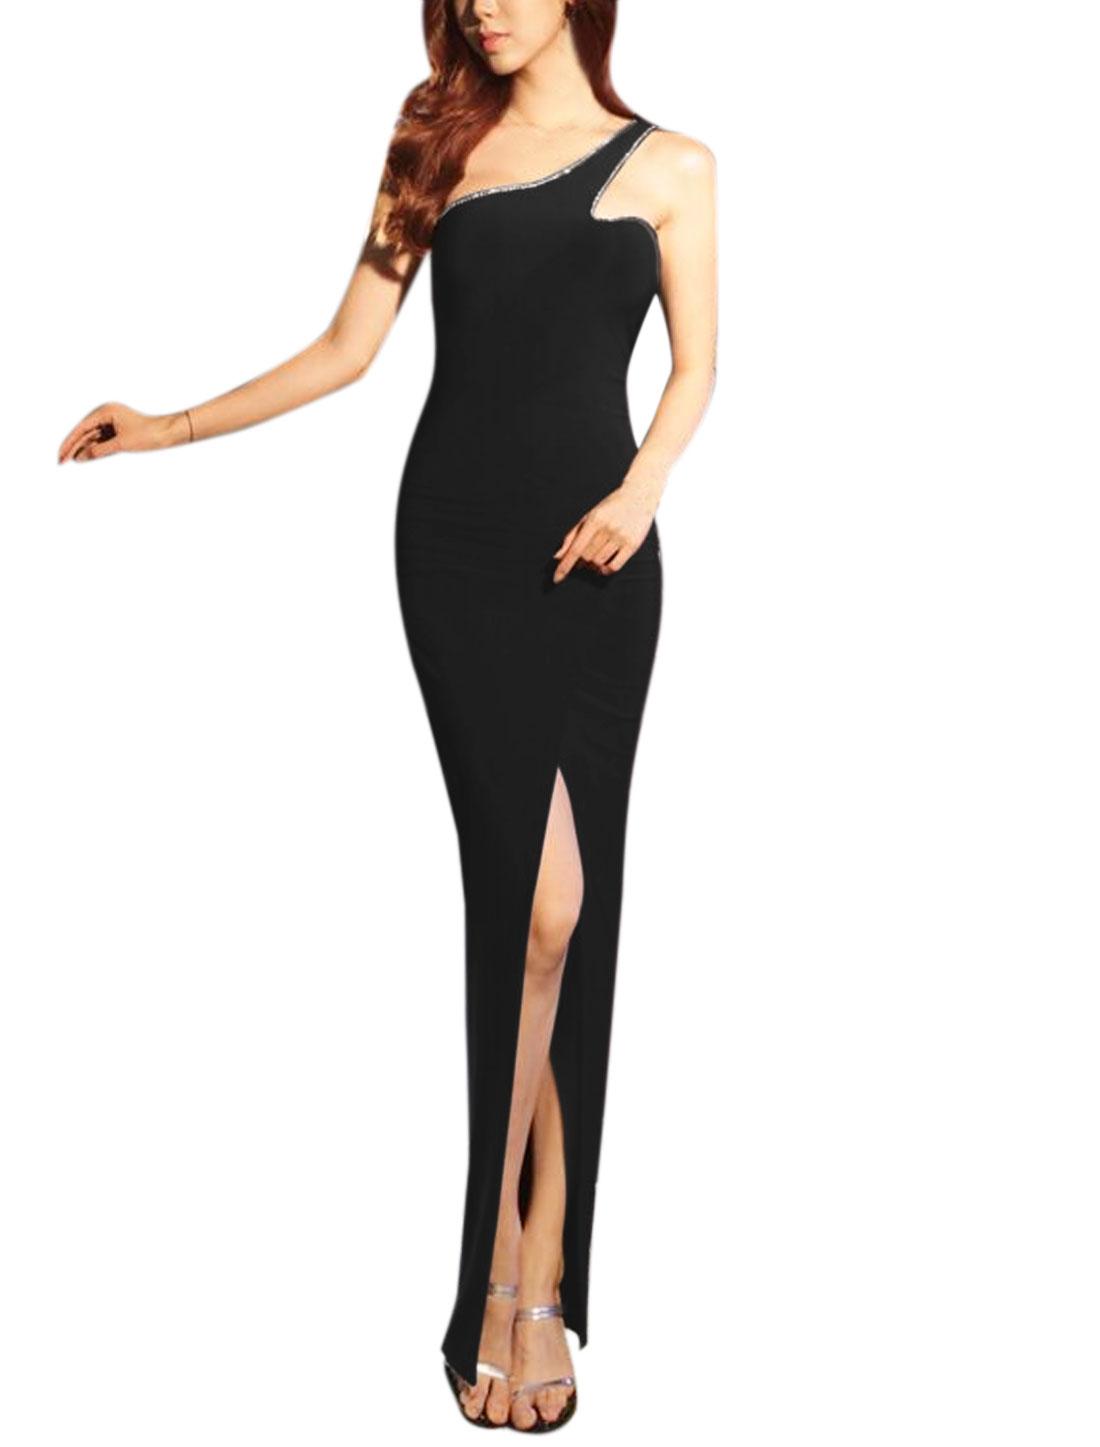 Women Rhinestone Decor One Shoulder High Split Maxi Dress Black XS